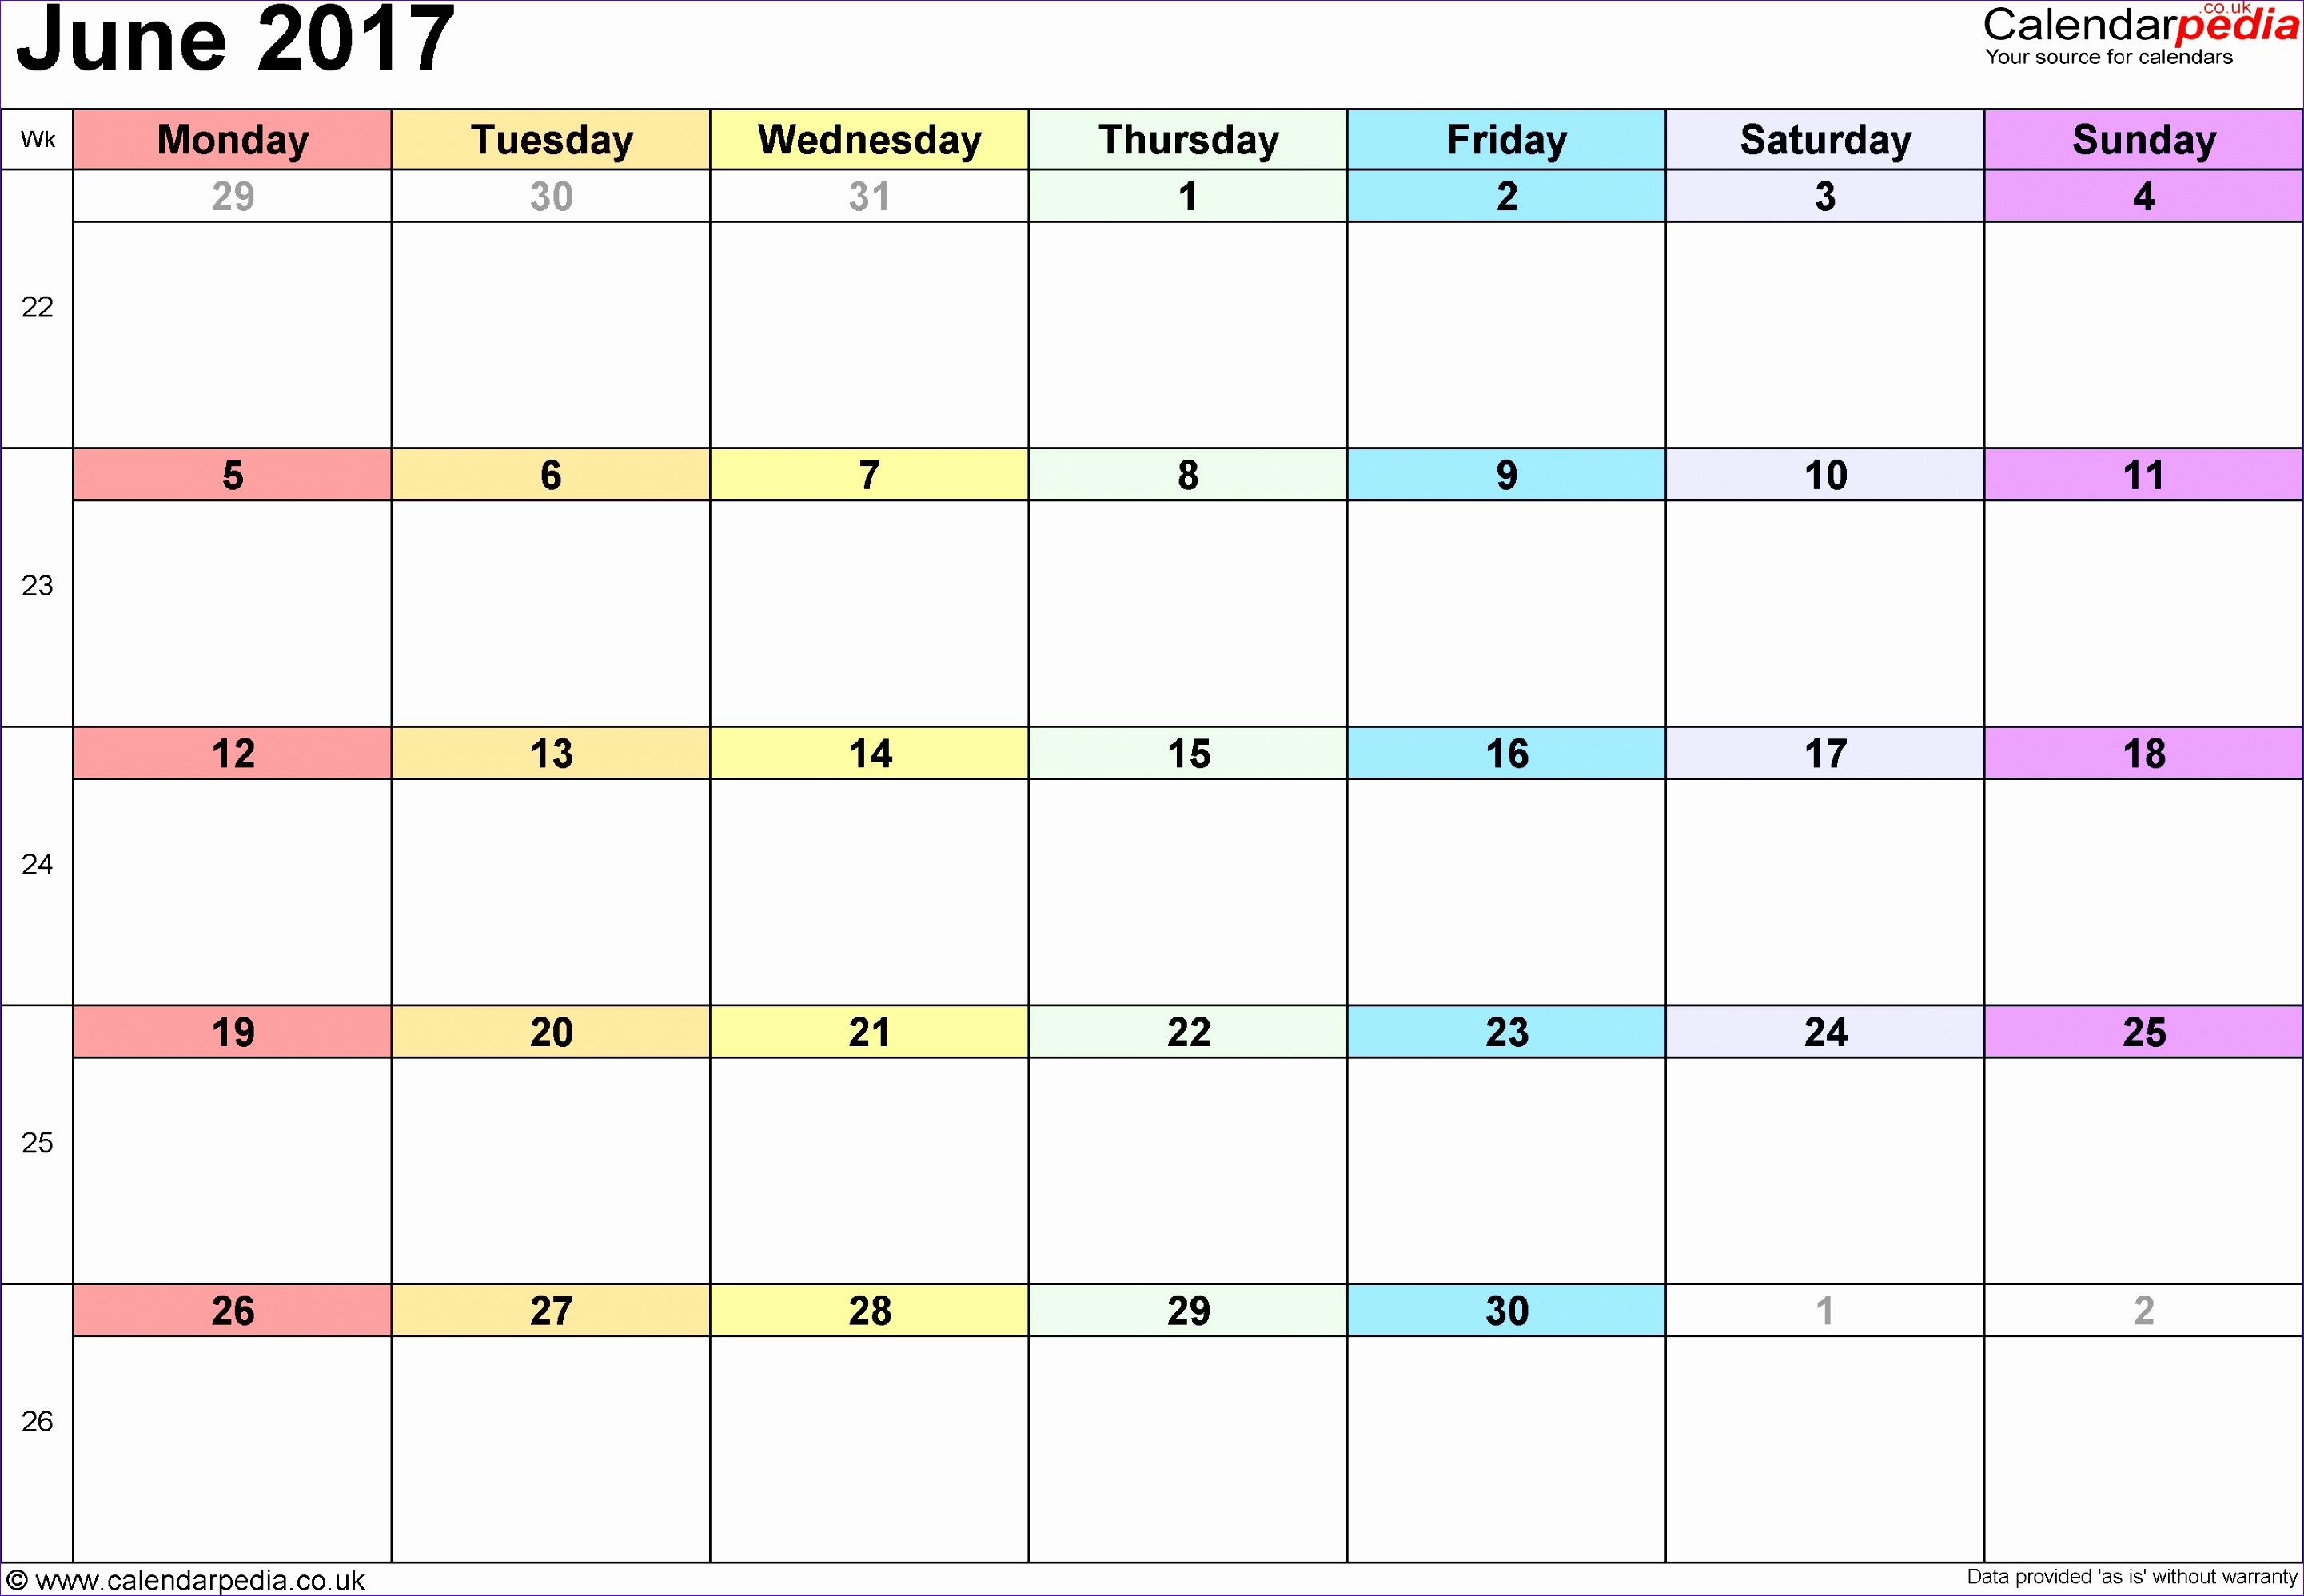 calendar june 2017 uk bank holidays excelpdfword templates example 28821997